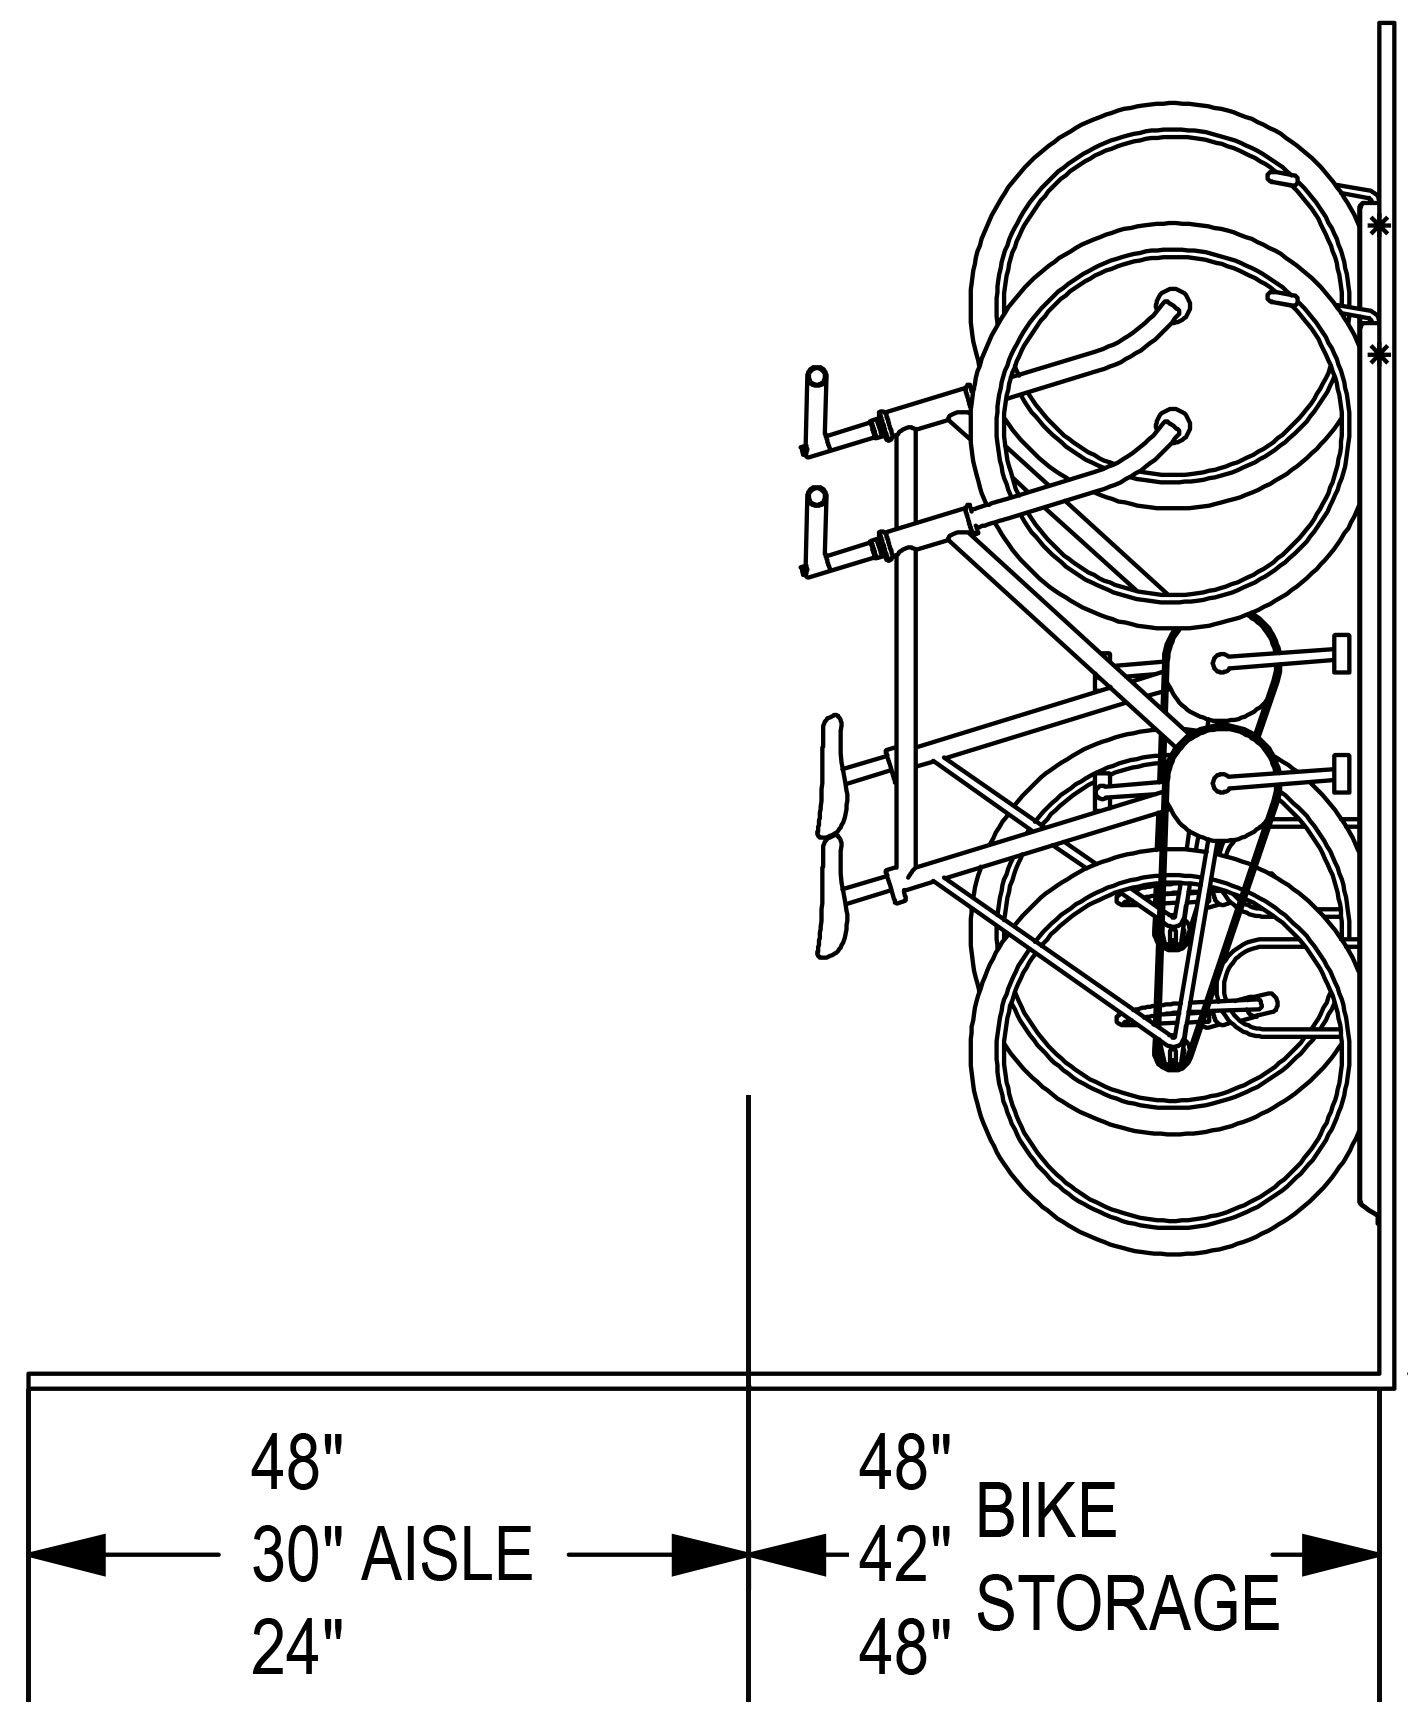 Madrax-Vertical-Bike-Storage-Vertical-View